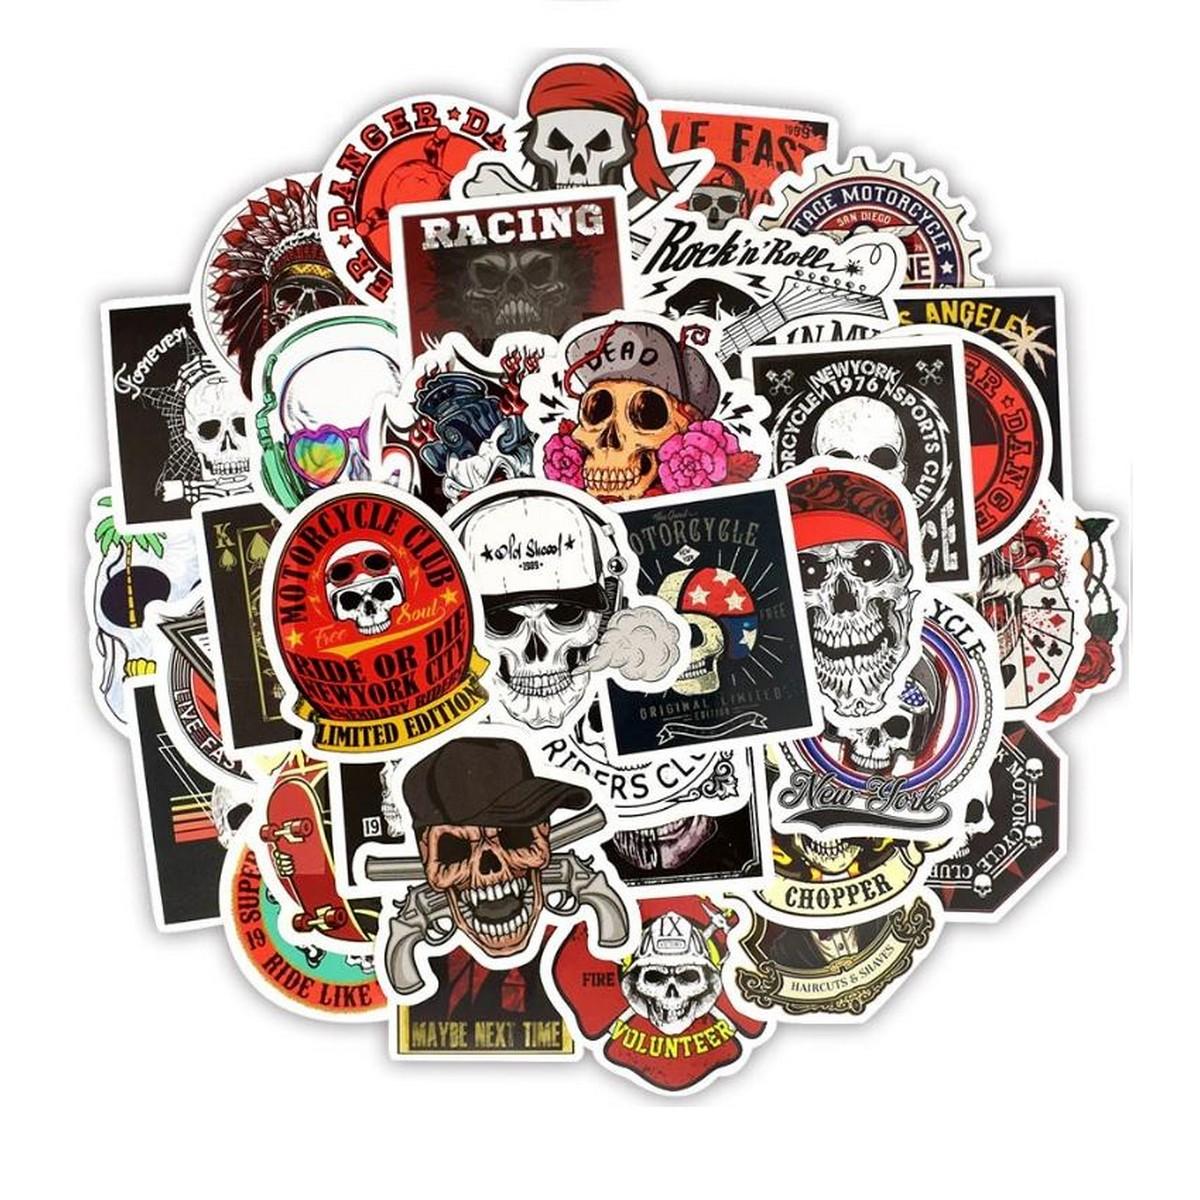 10 Pcs/Pack Skeleton Ghost Skull Punk Rock Horror Waterproof Stickers for Car Bike Laptop Skateboard TV Guitar